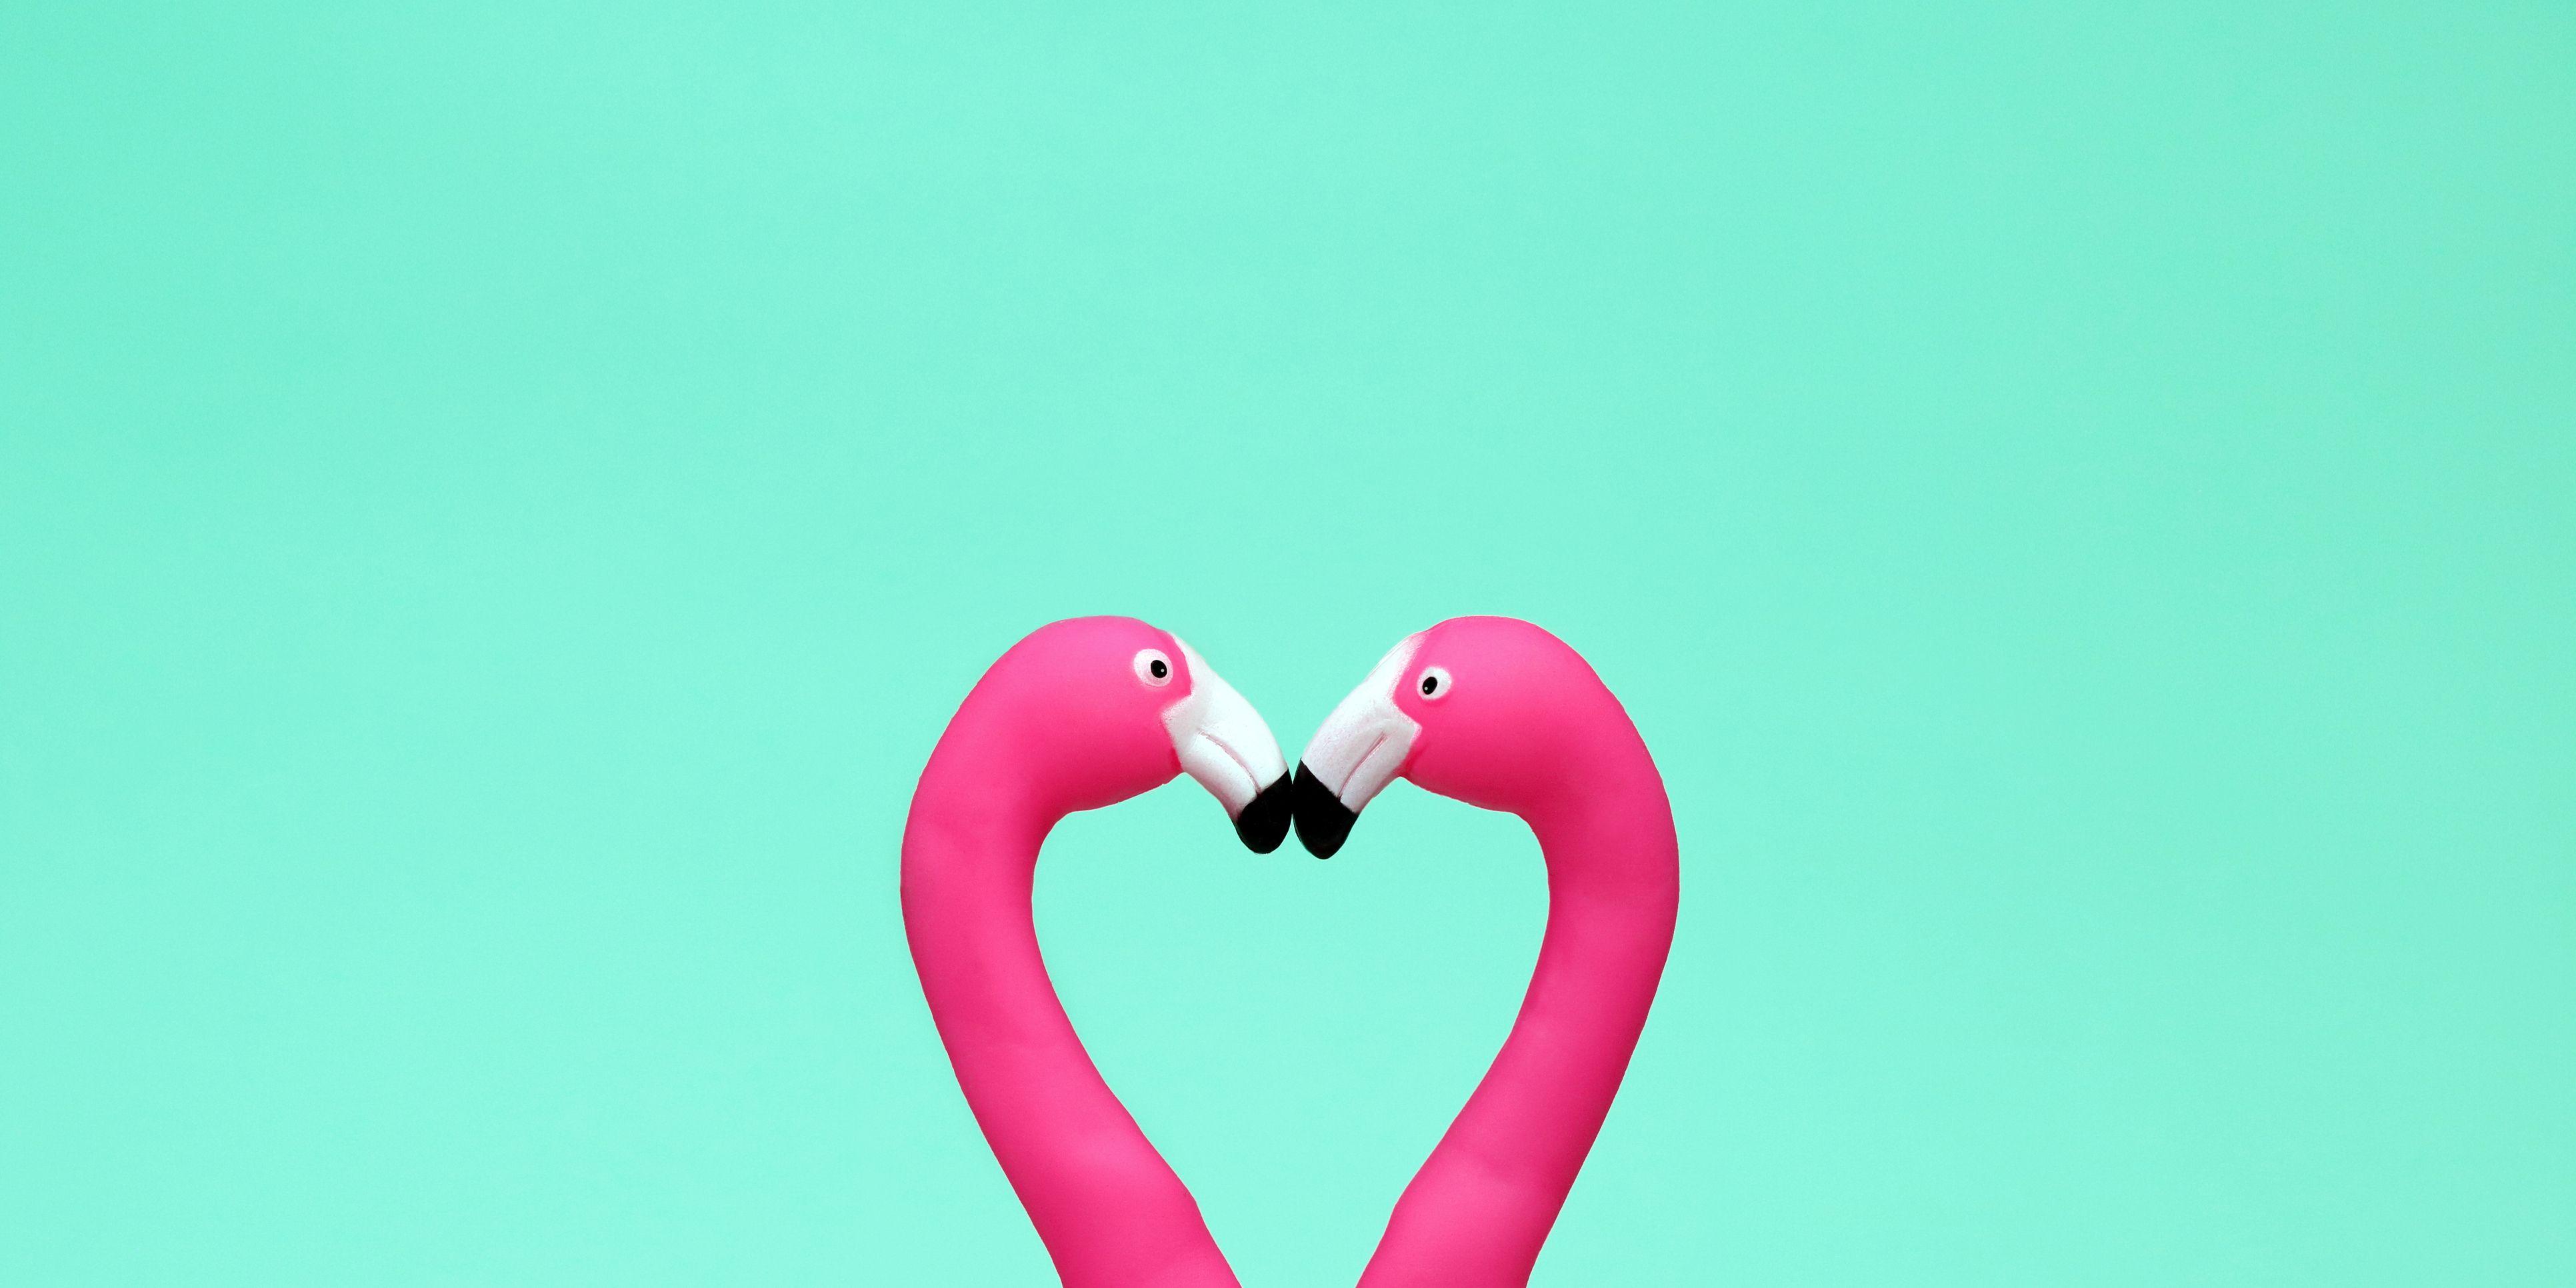 flamingo love heart friends kiss